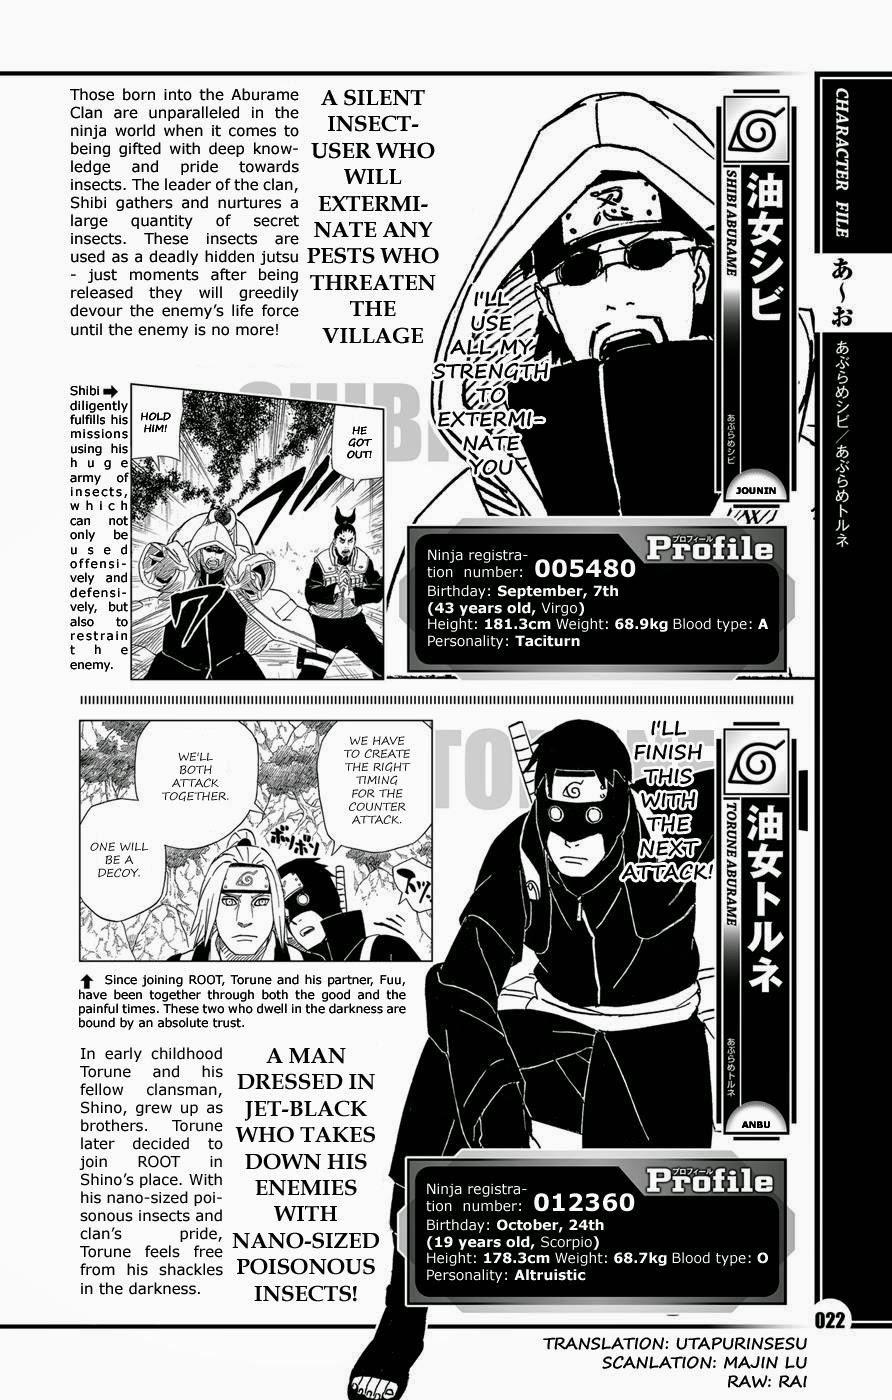 Boruto e Sarada vs Fu e Torune DB4_SHIBI_TORUNE